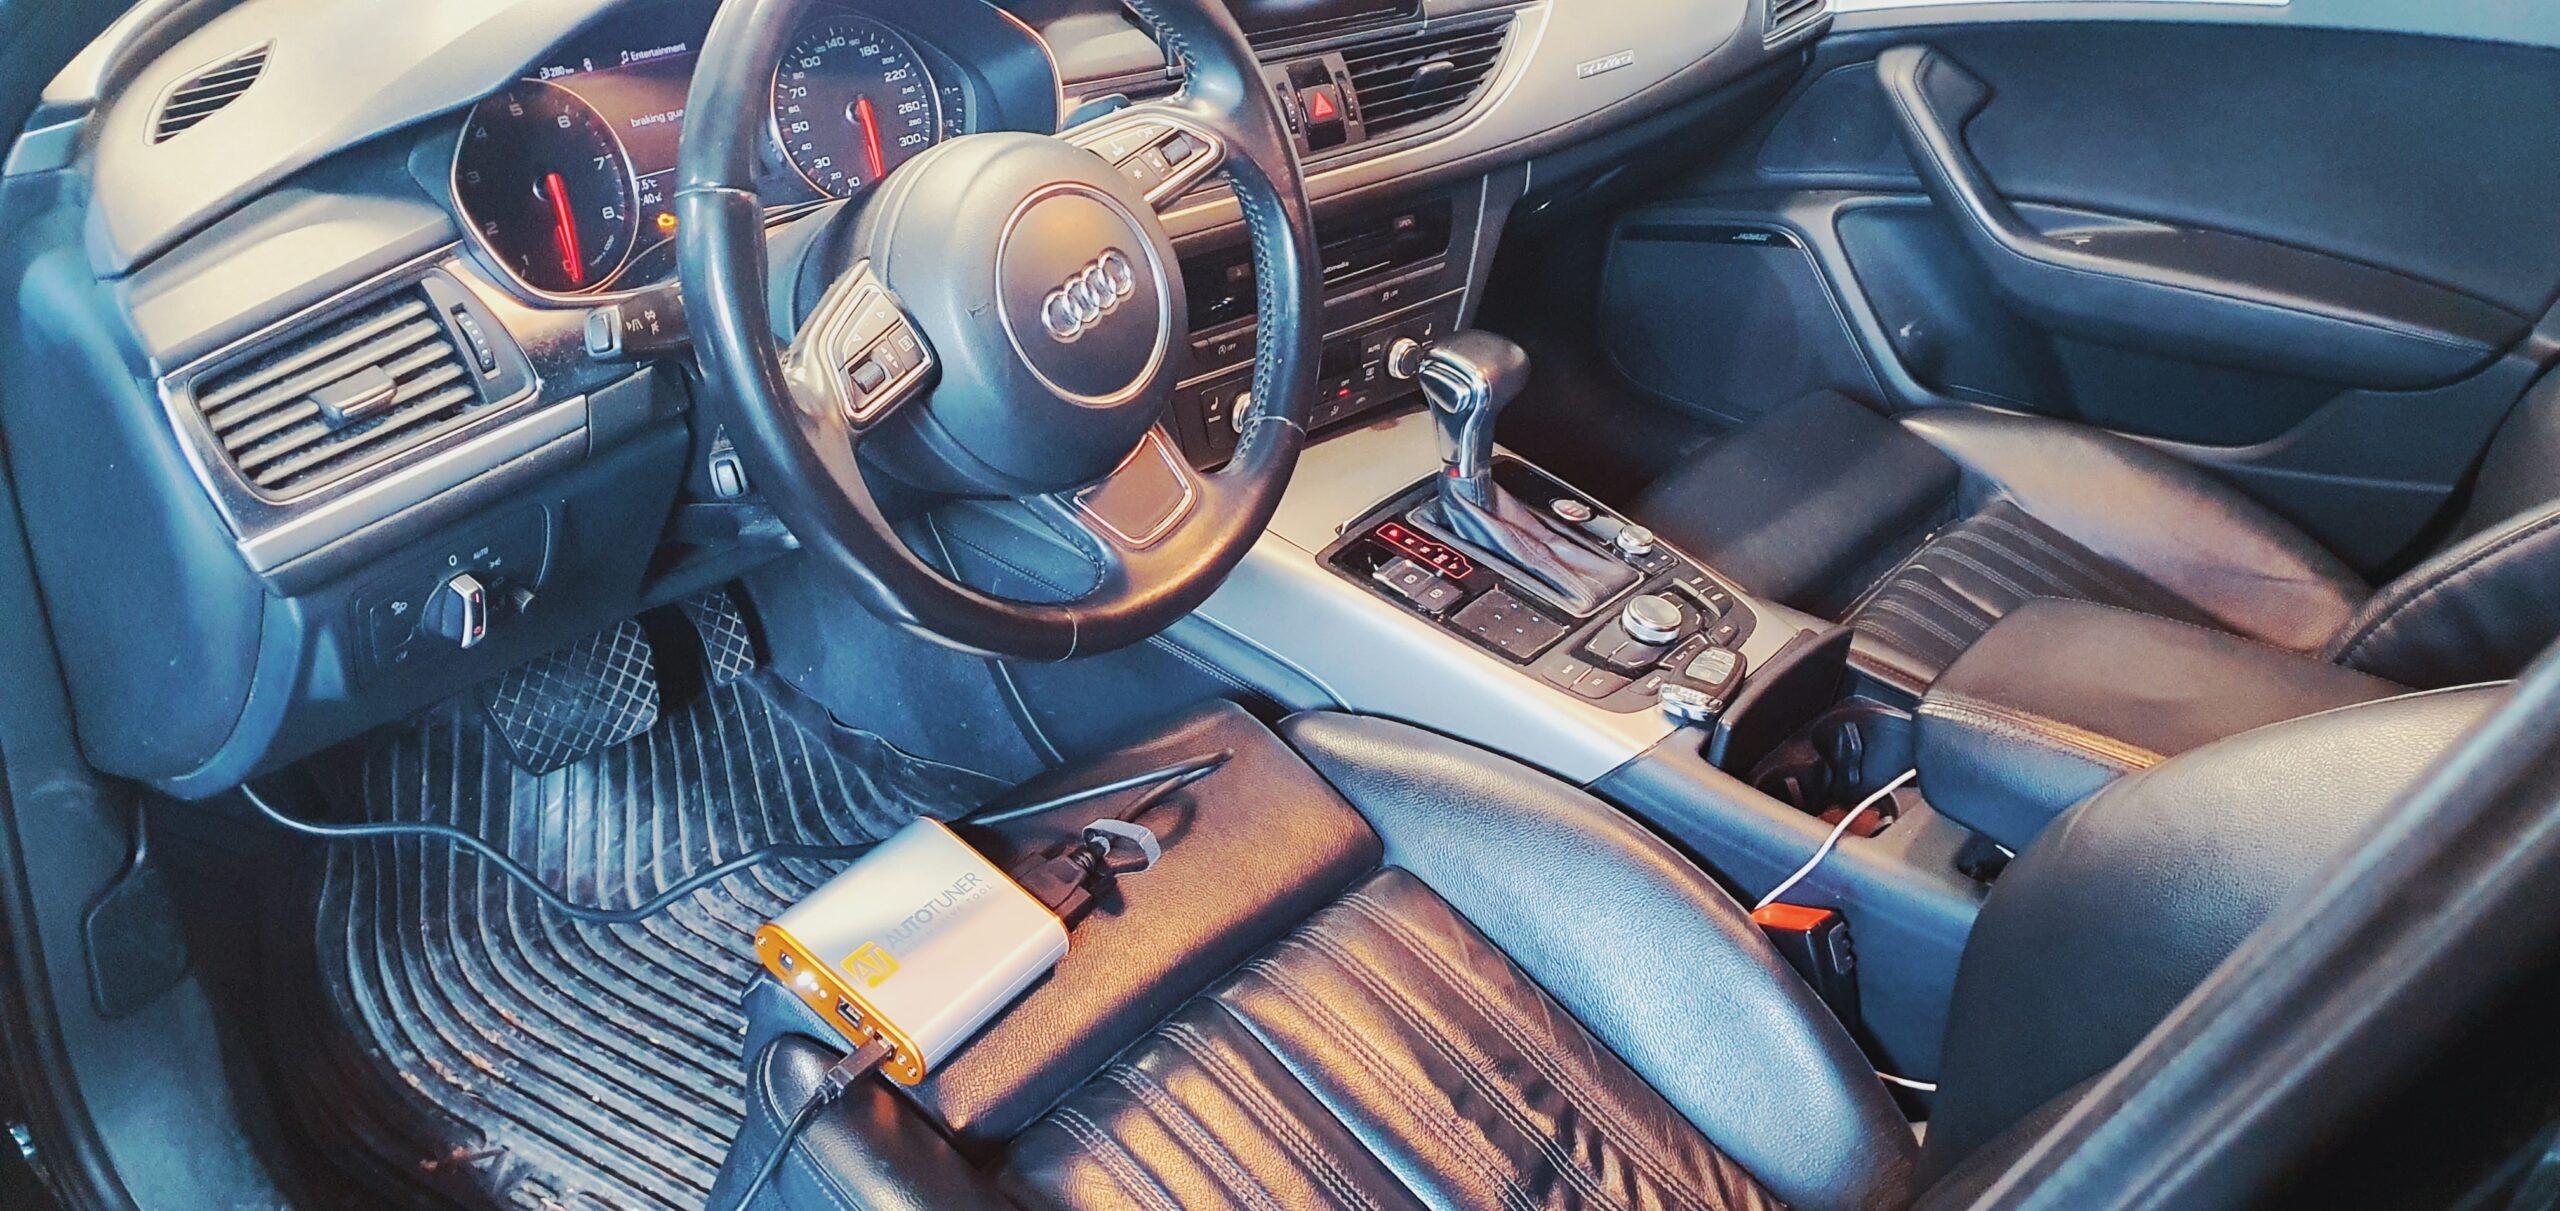 Chiptuning Audi A6 C7 3.0 TFSI 300ps